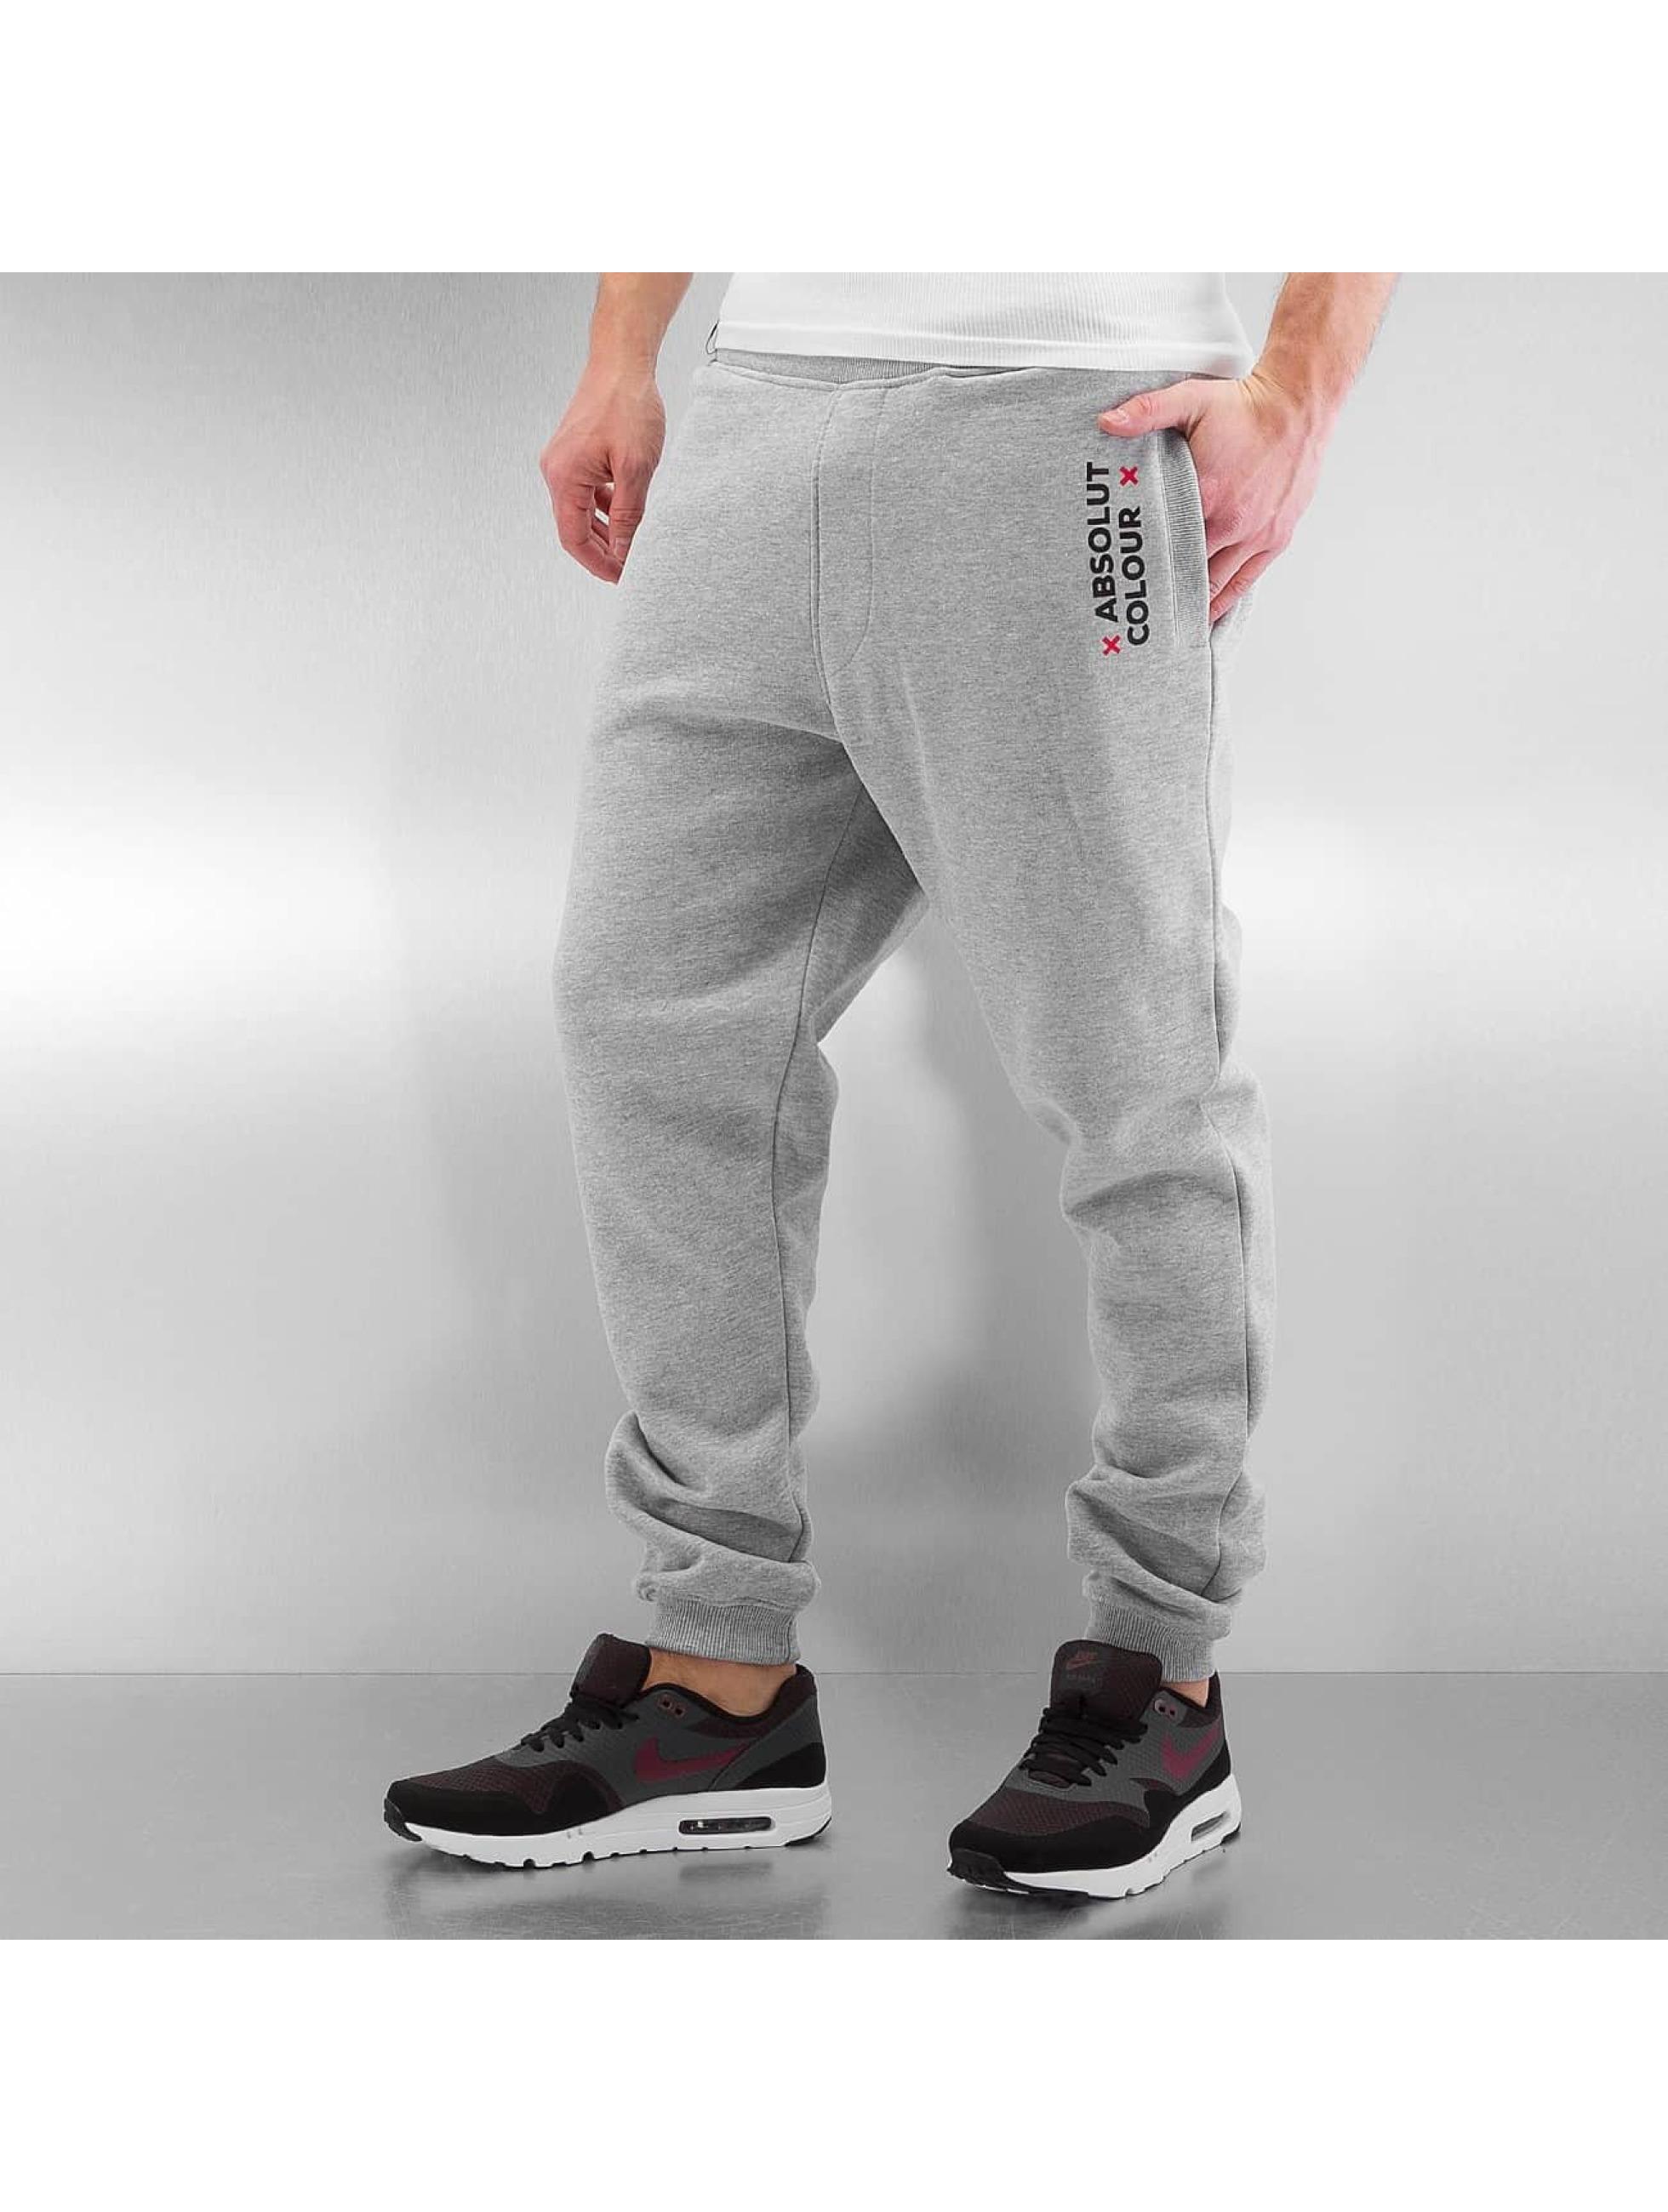 Werben Angebote Dangerous DNGRS Männer Jogginghose Absolut in grau